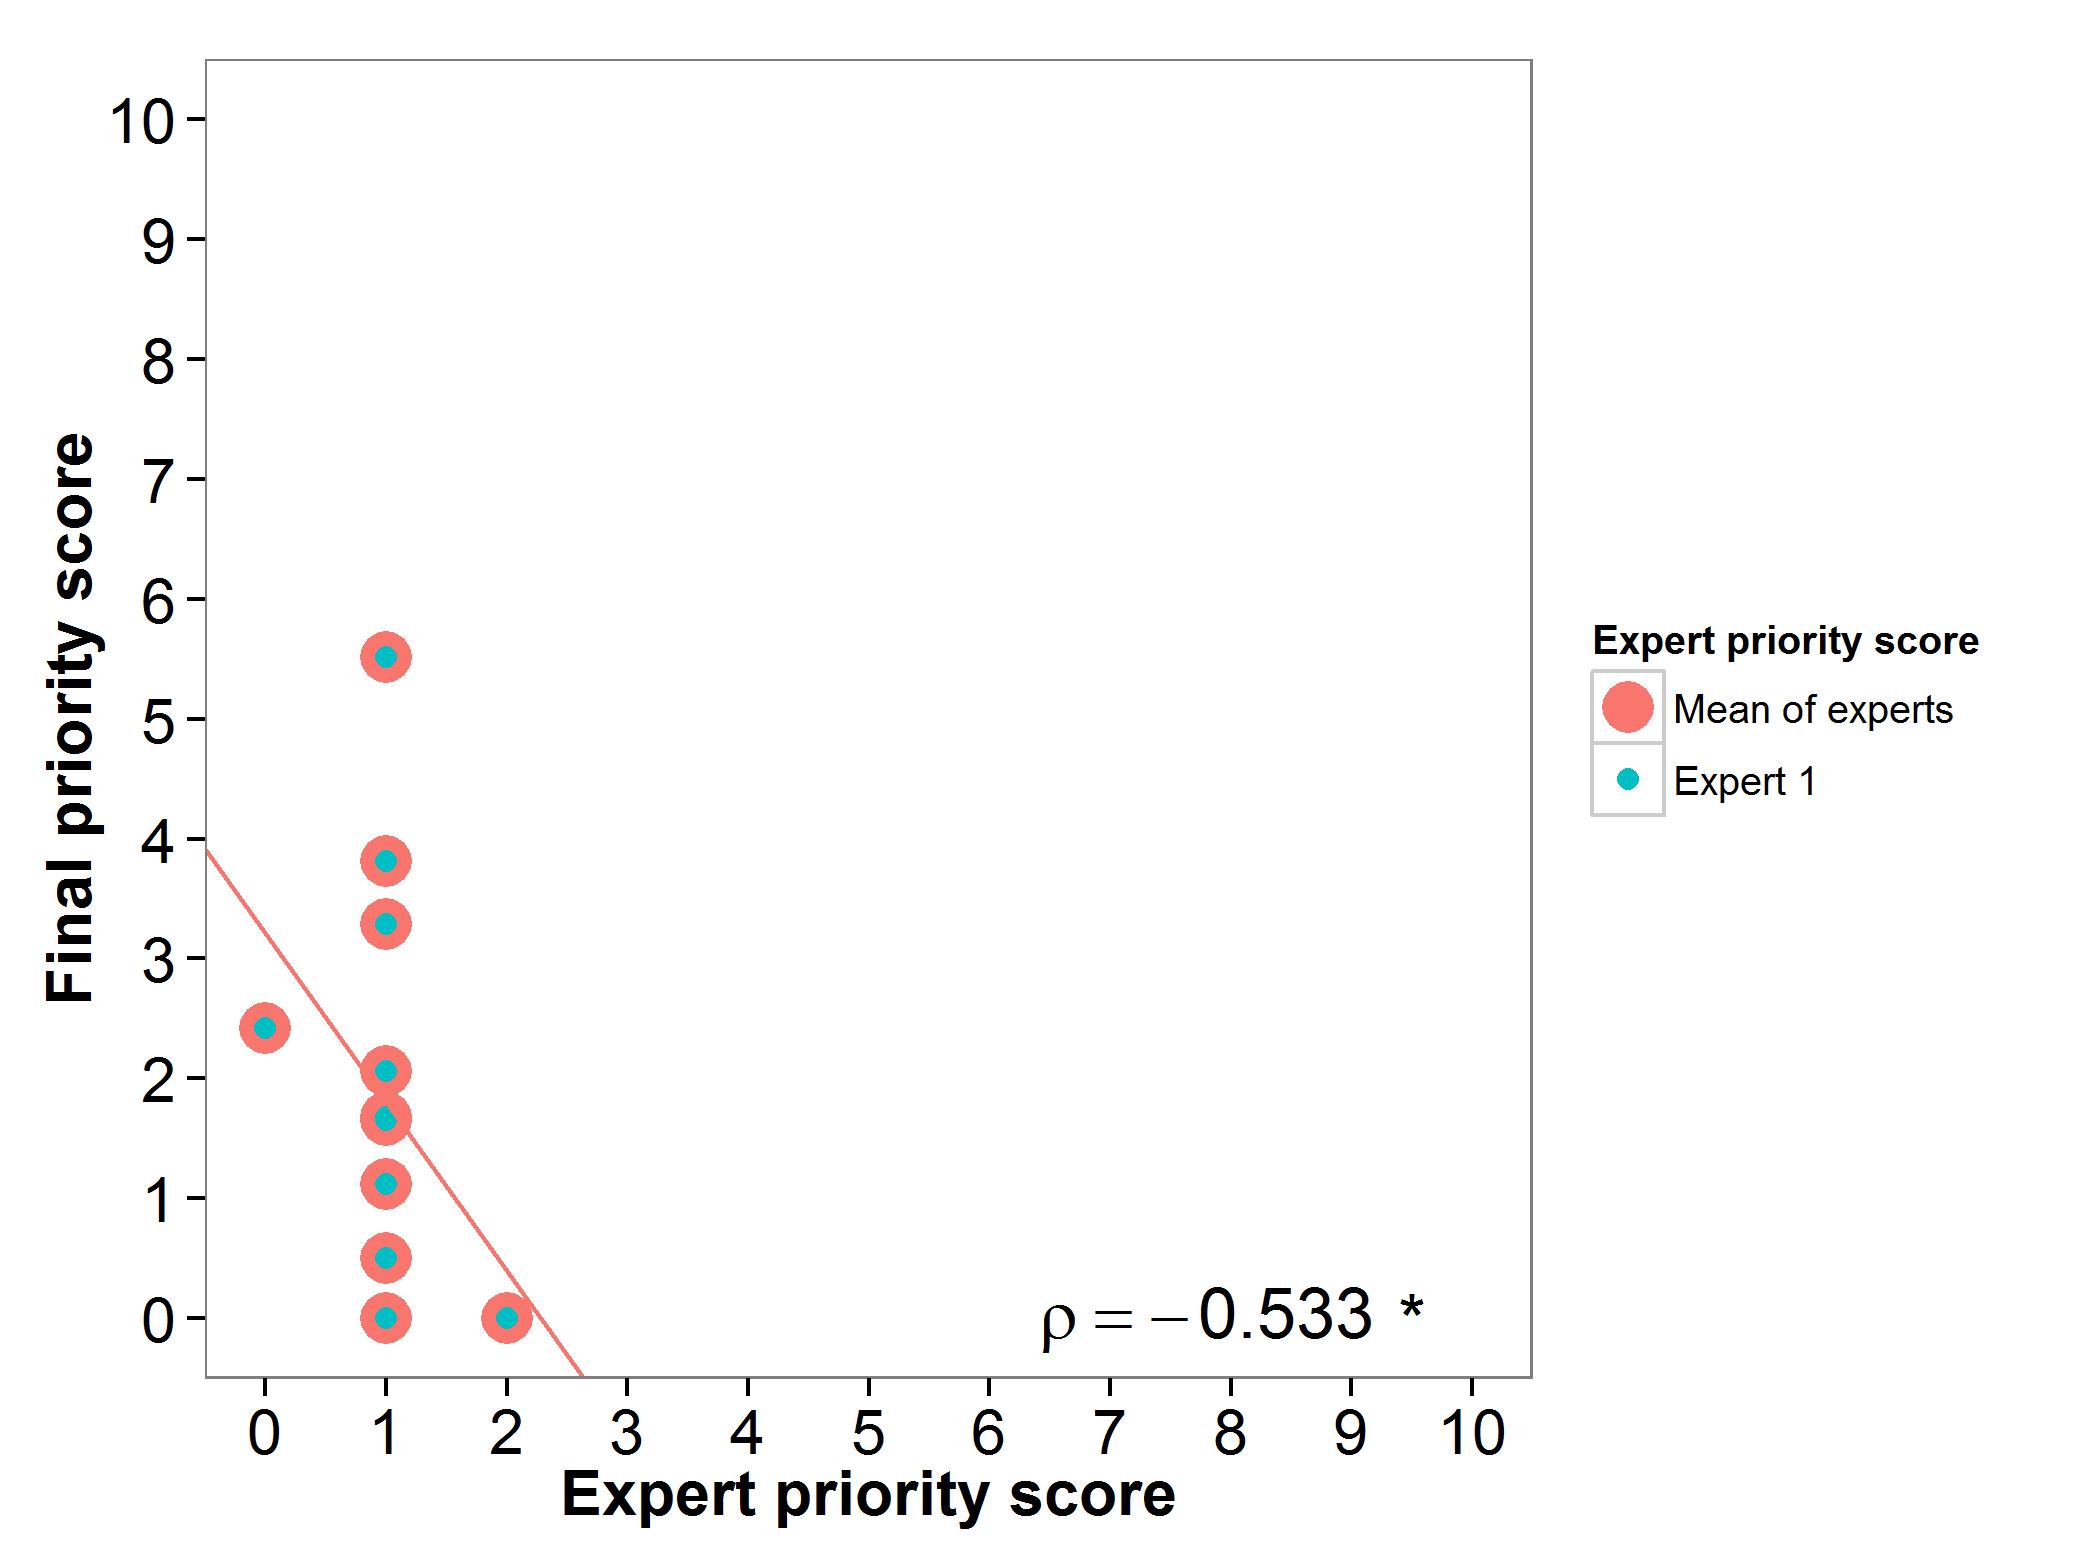 Figure 3 Expert